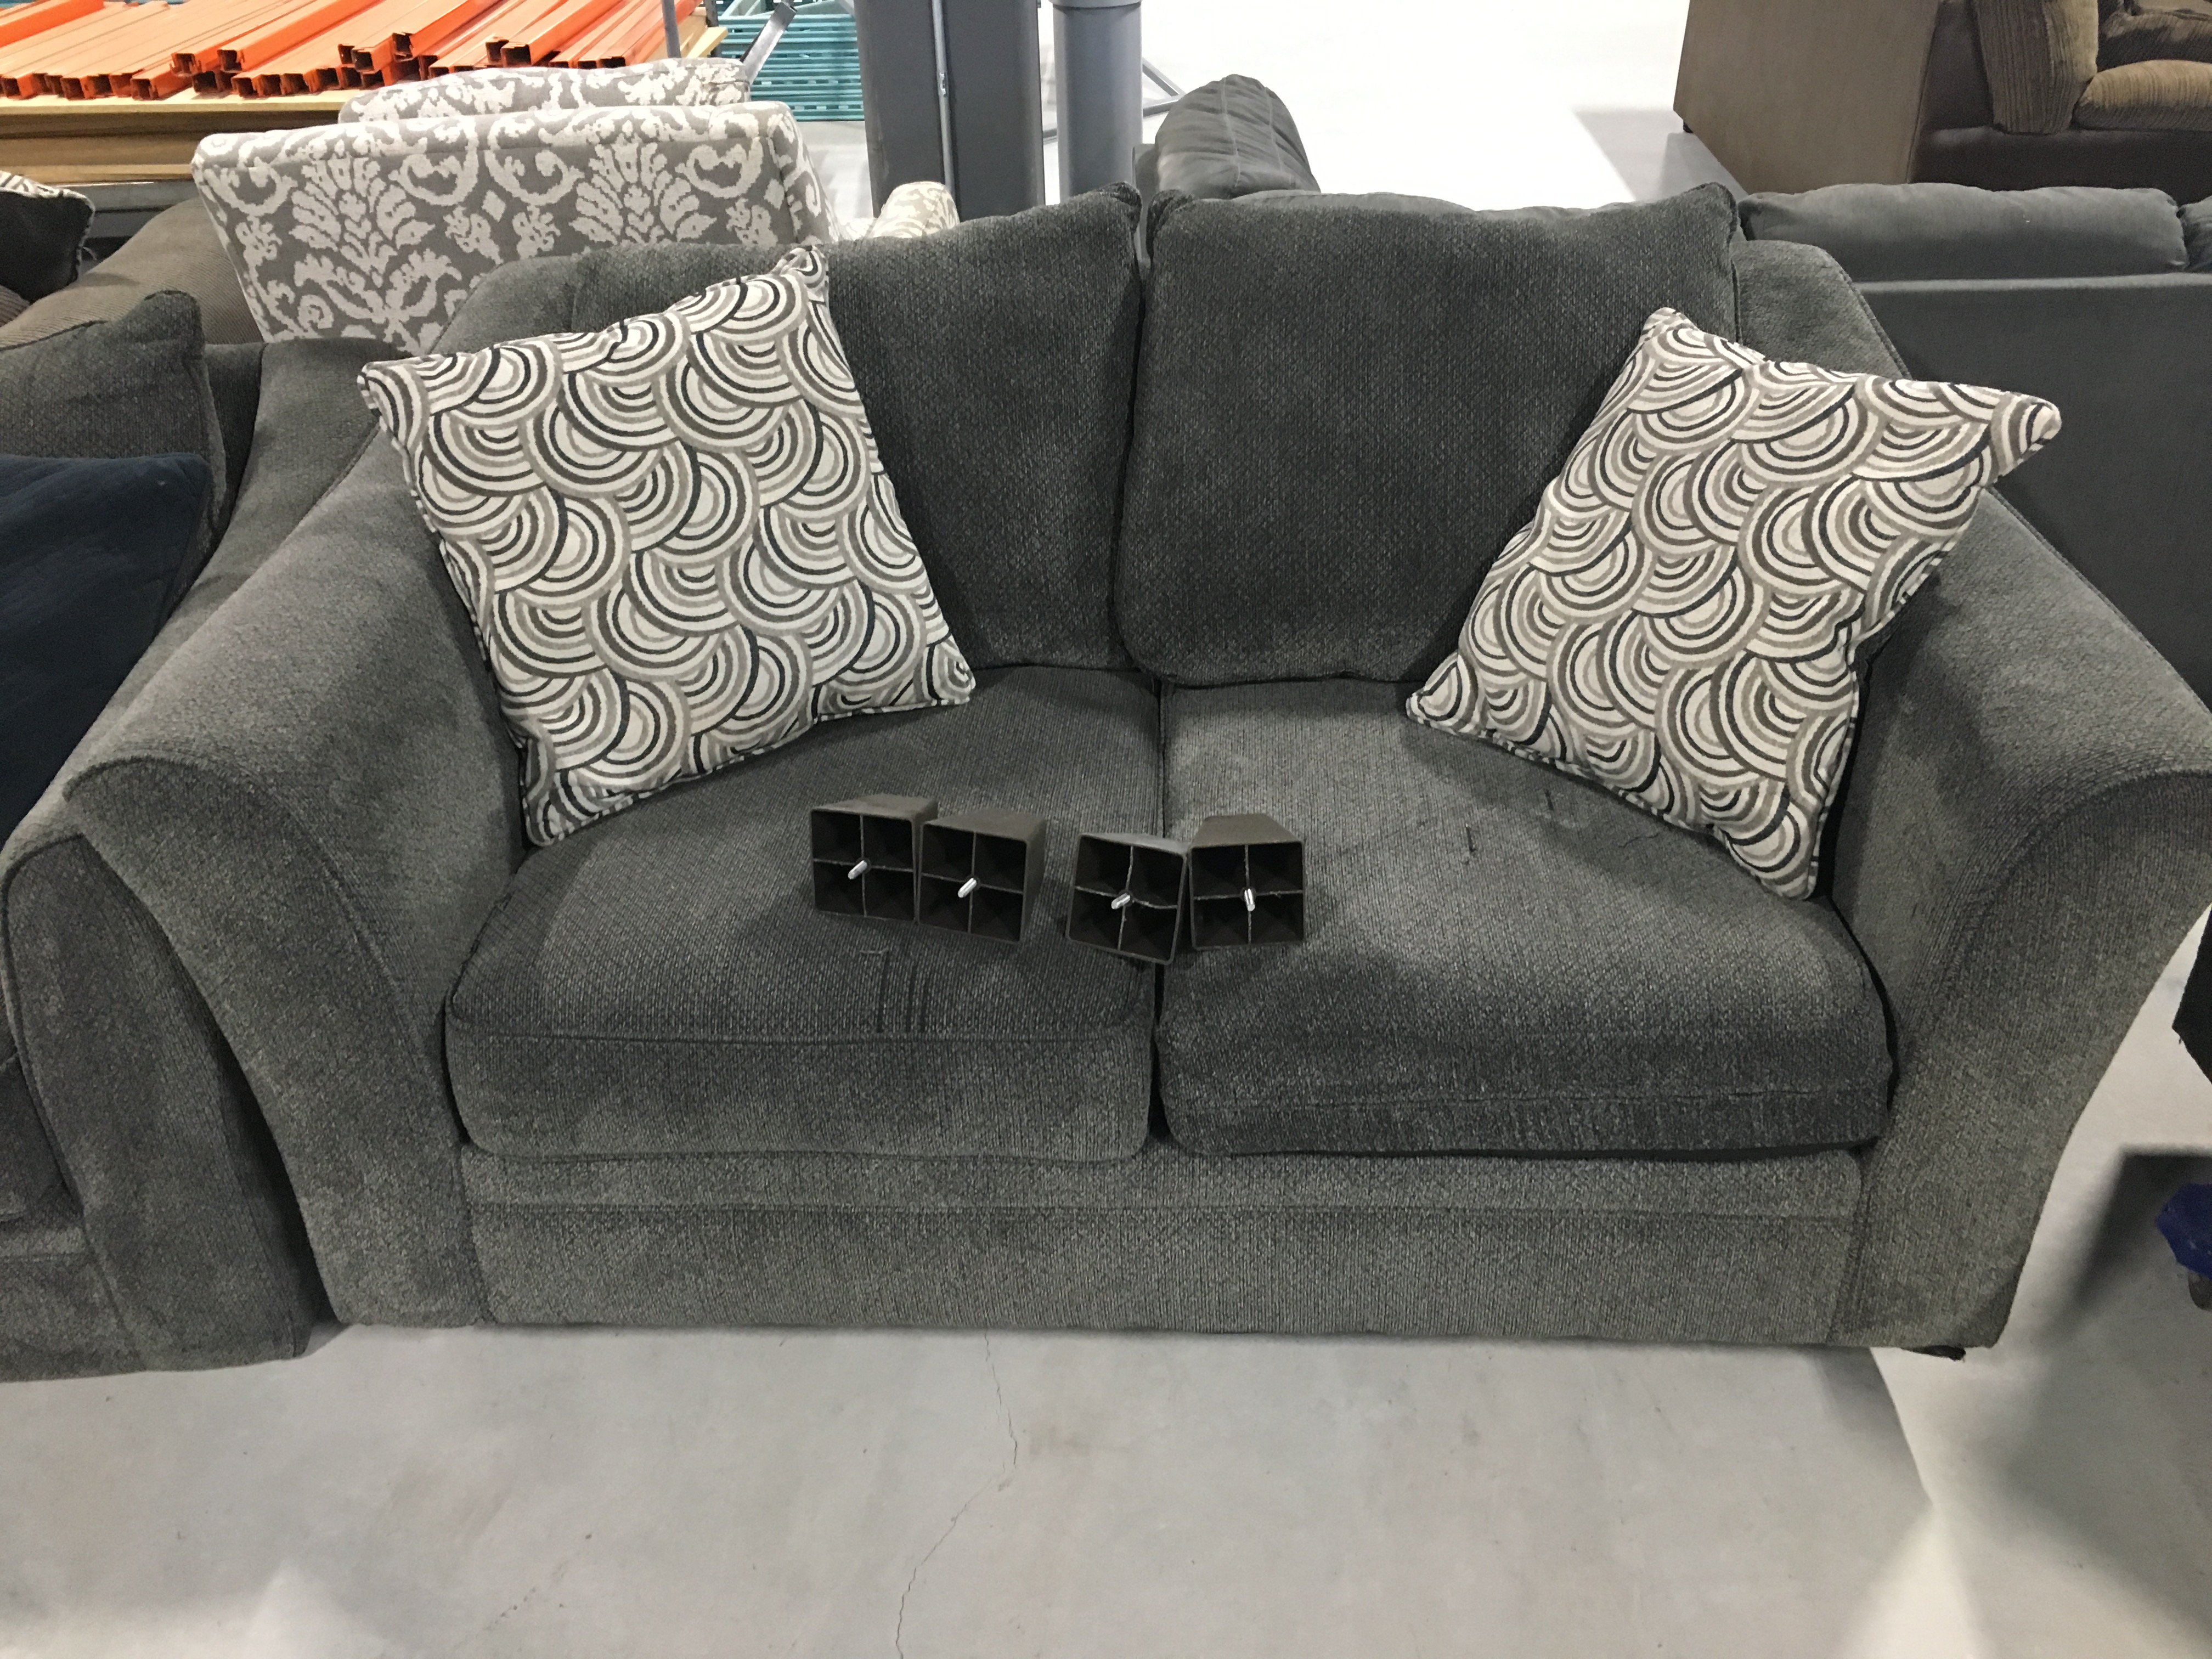 Furniture Returns Online Auc